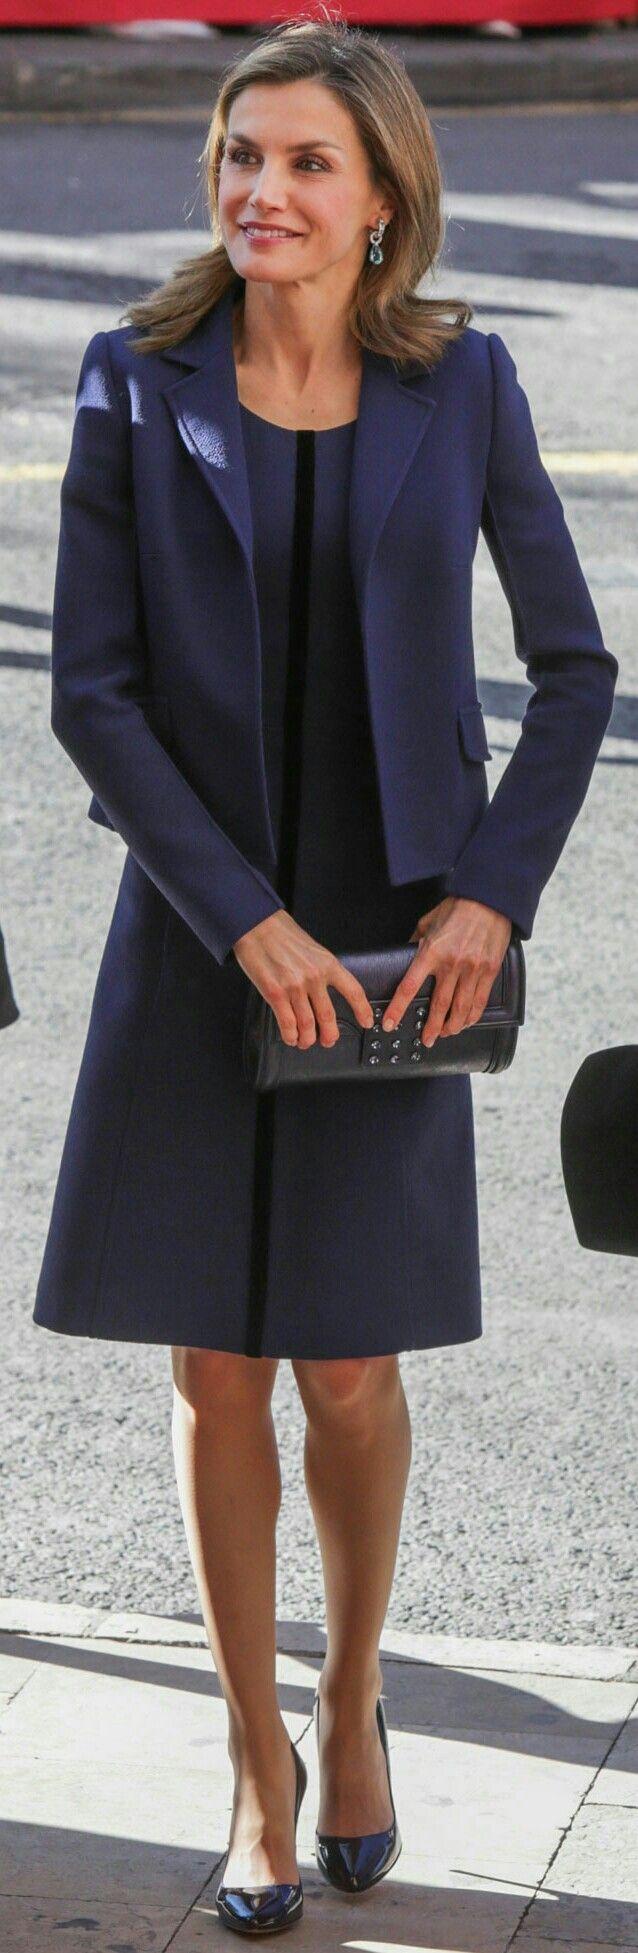 Letizia - Felipe Varela dress + handbag, Magrit pumps, Bvlgari earrings